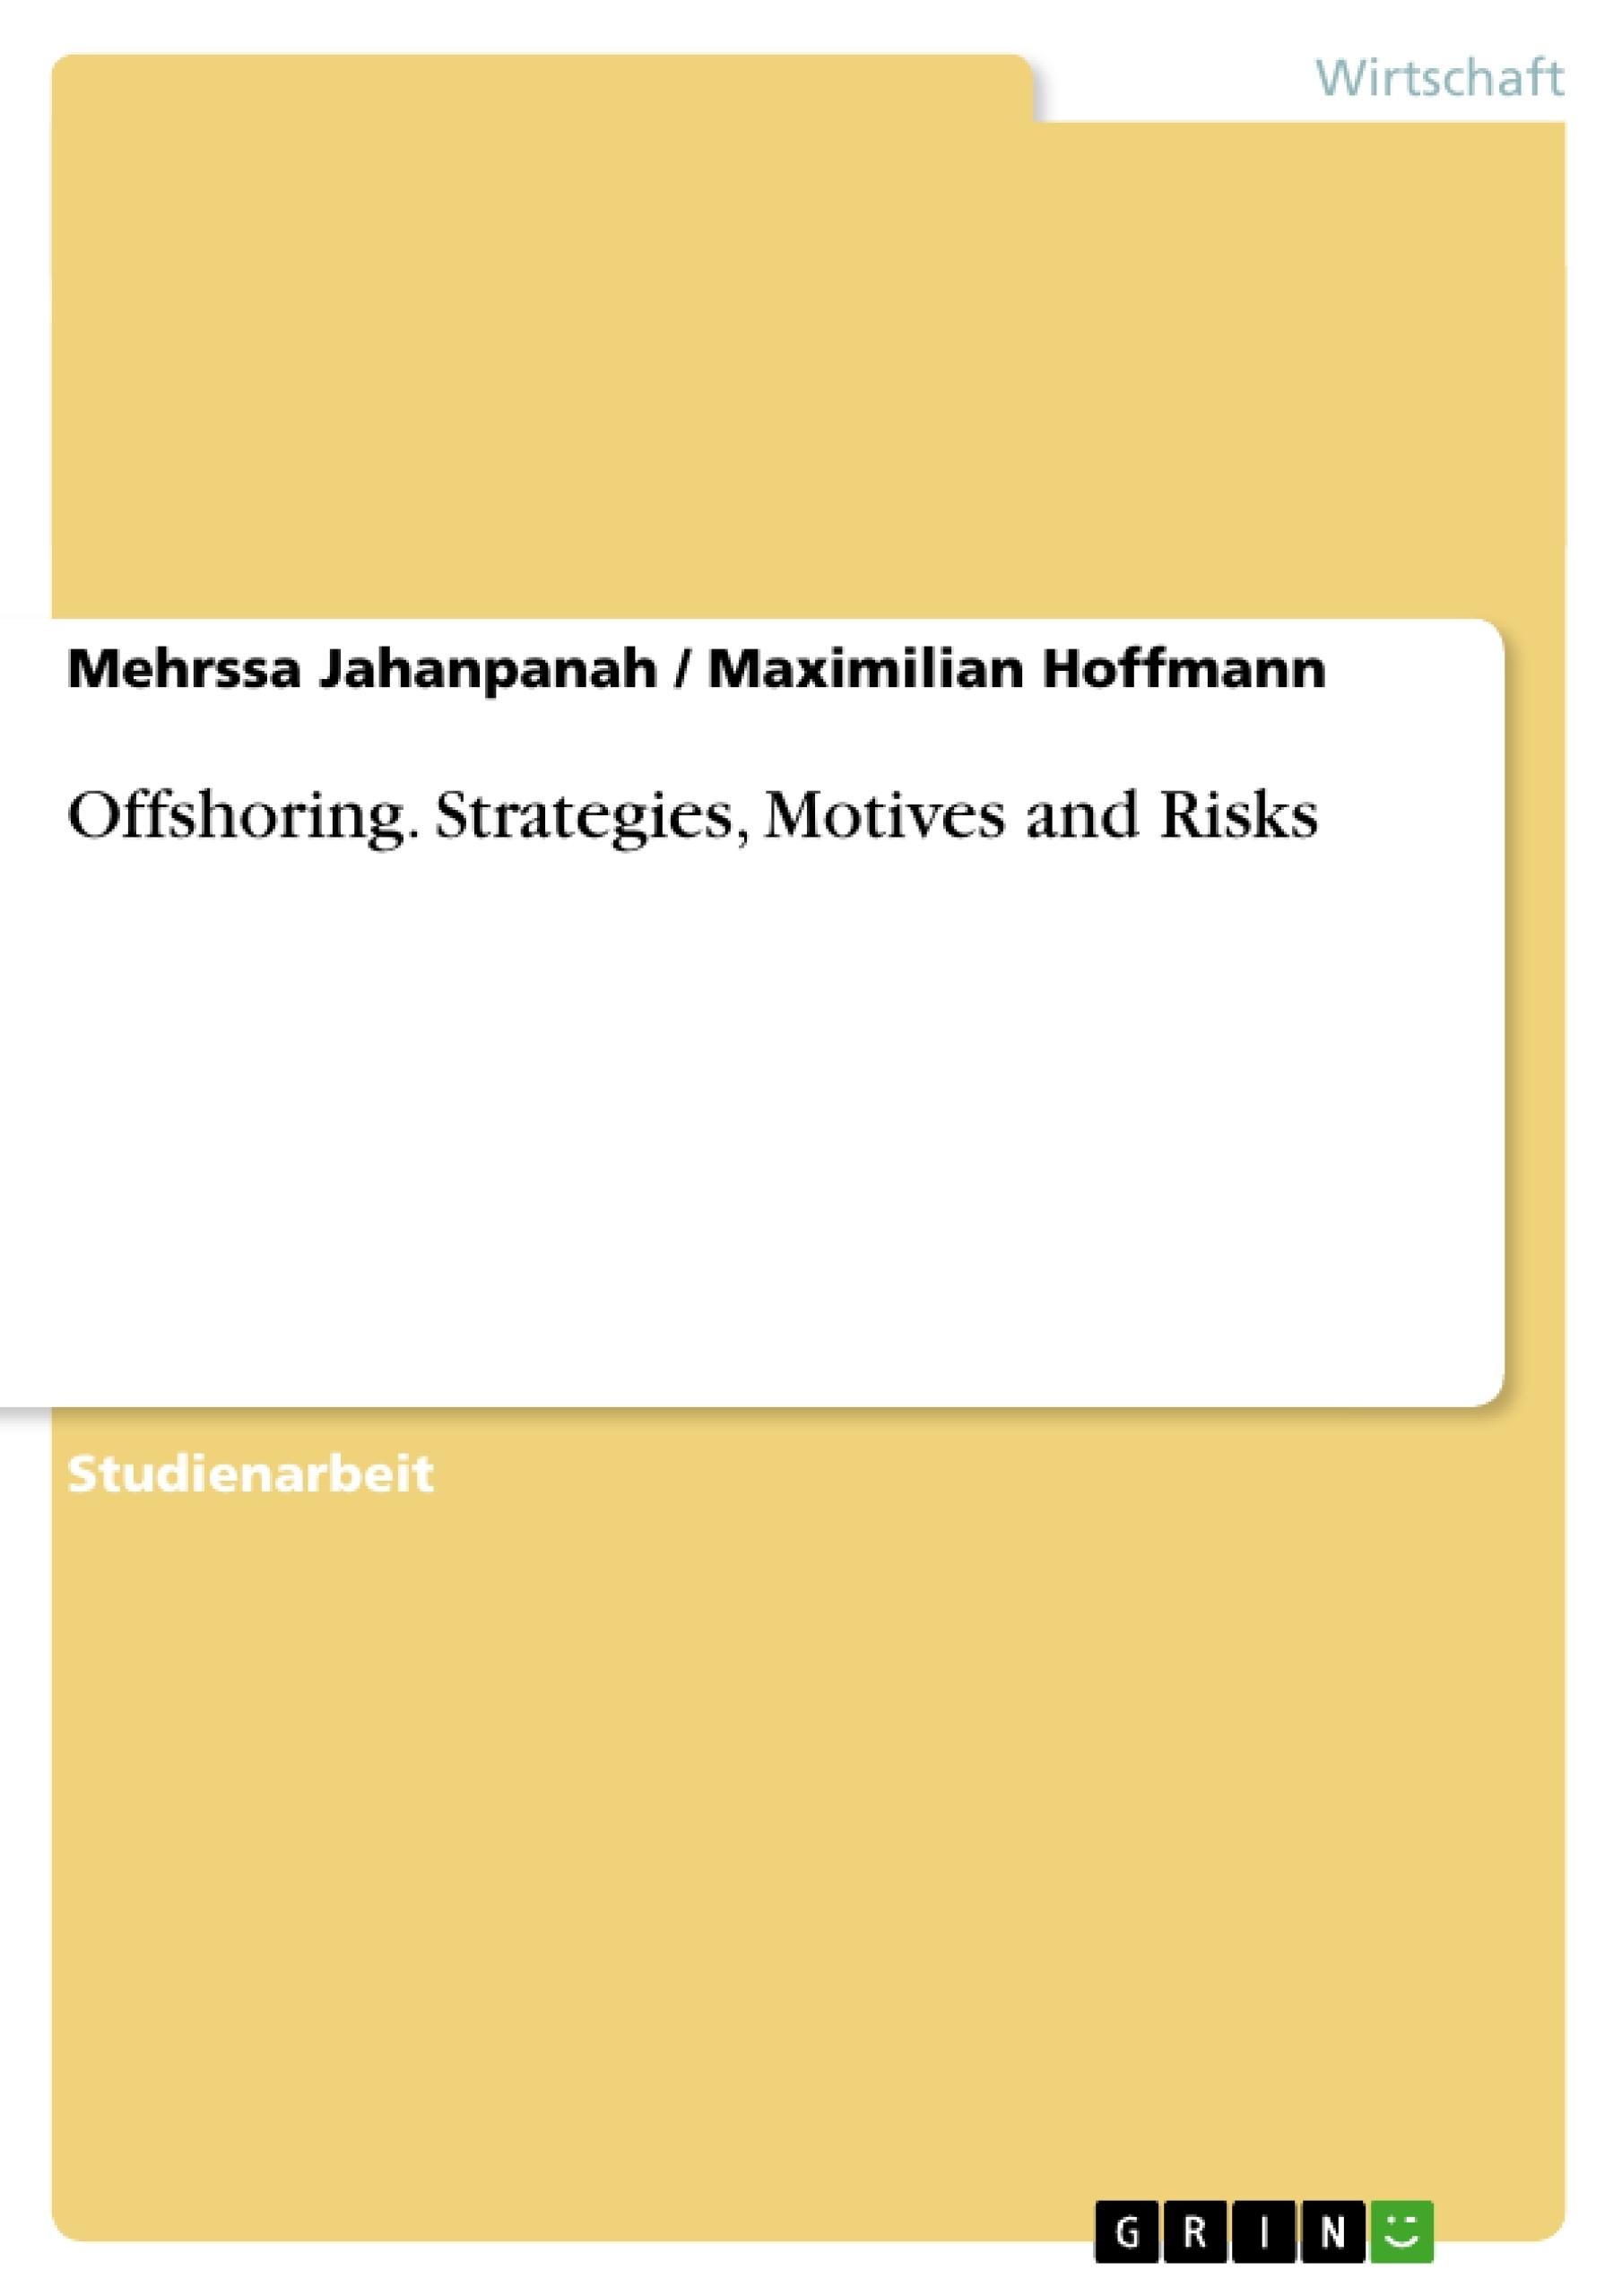 Titel: Offshoring. Strategies, Motives and Risks